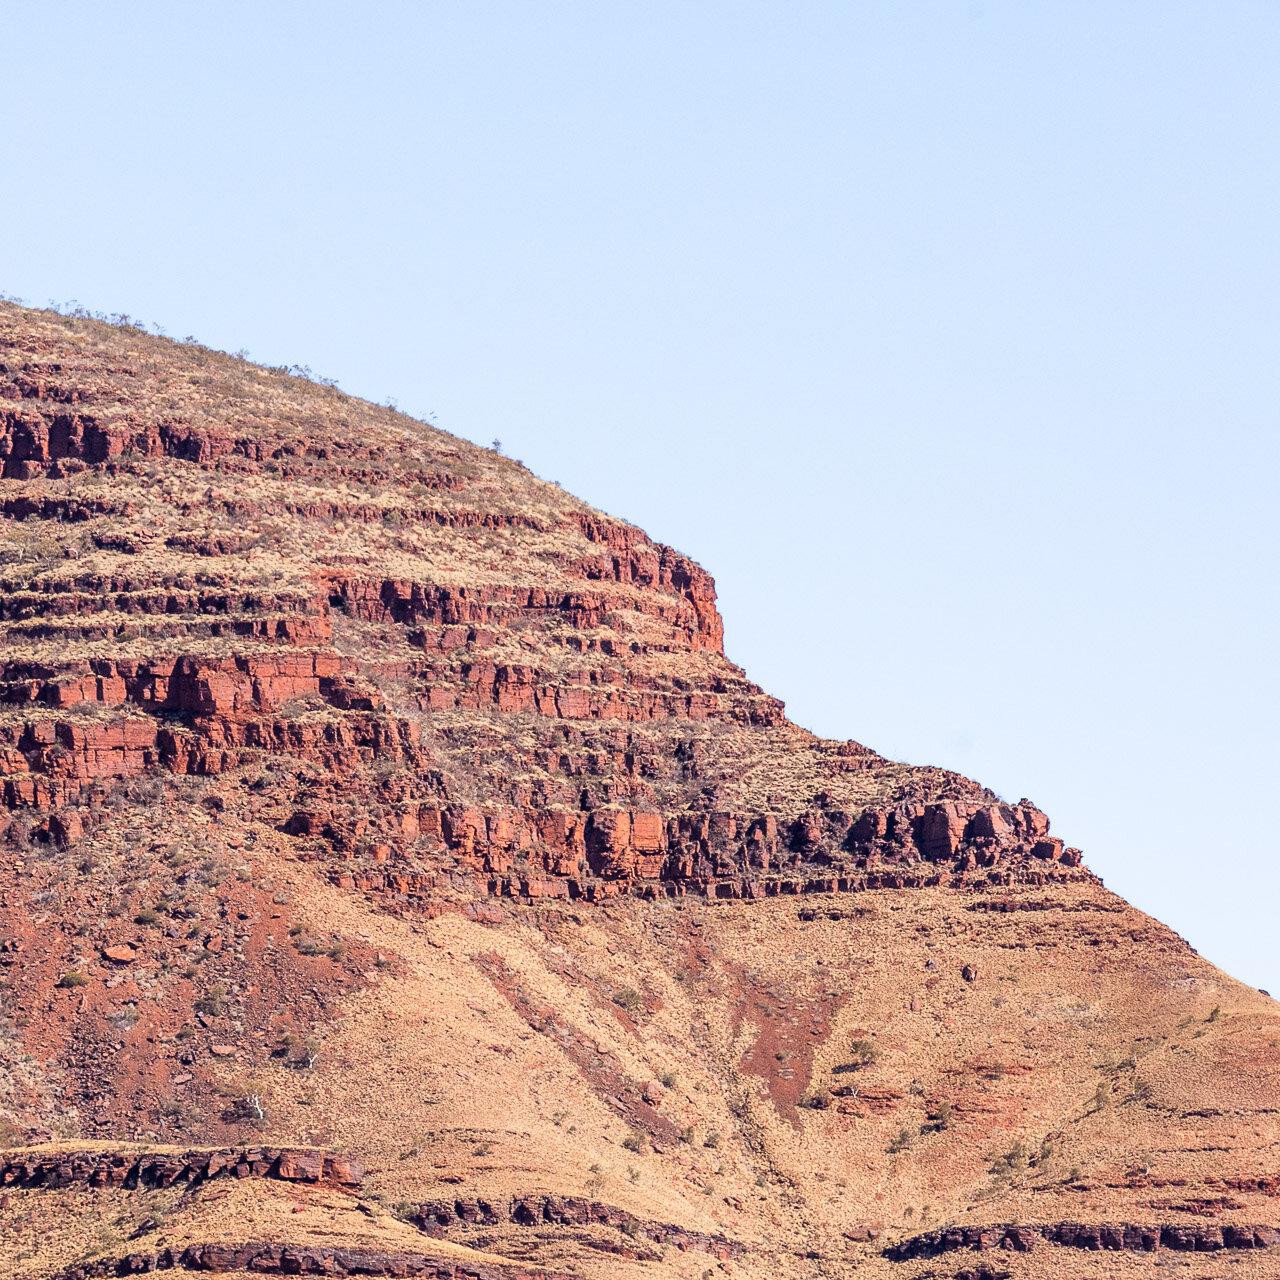 Rock formations in Karijini National Park in the Pilbara region of Western Australia